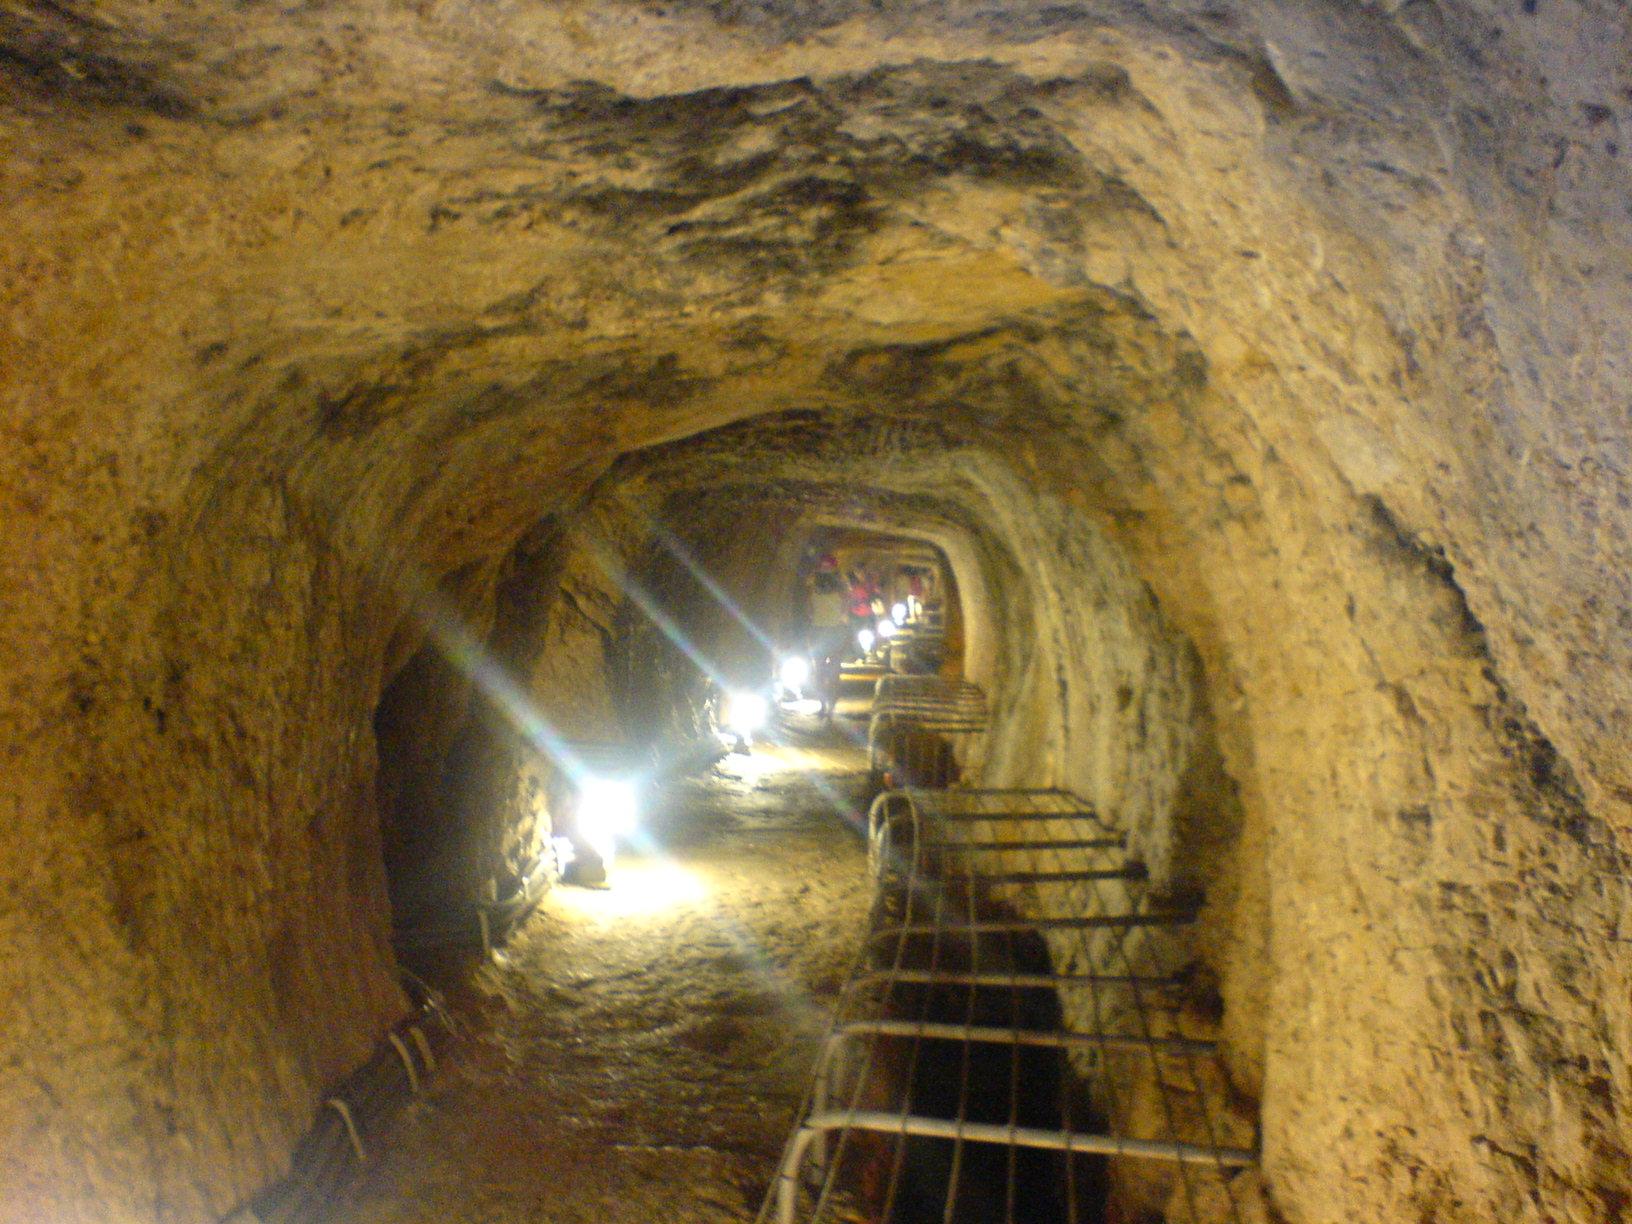 The Tunnel of Eupalinos